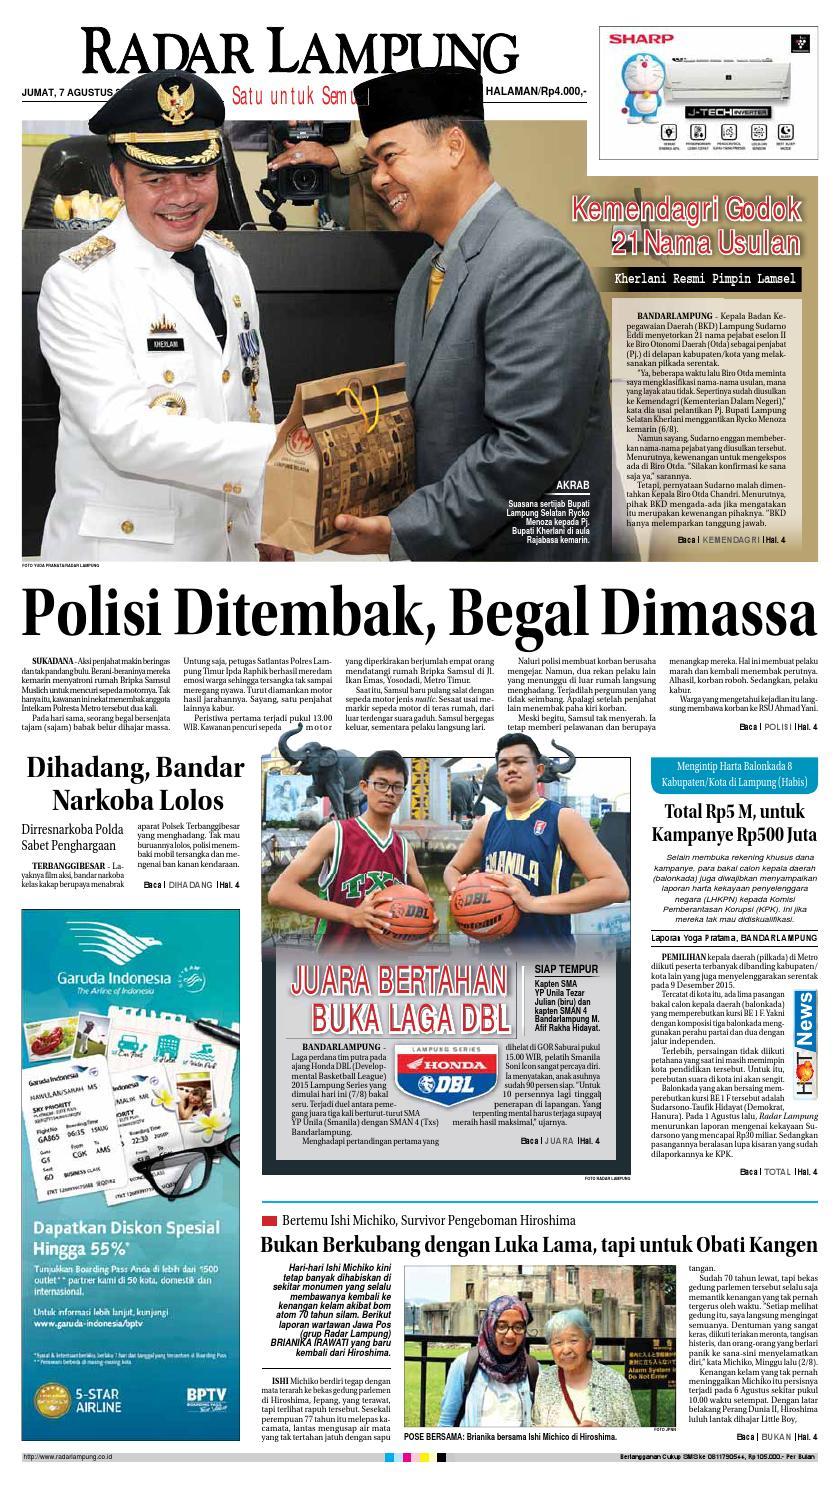 Radar Lampung Jumat 7 Agustus 2015 By Ayep Kancee Issuu Loop Hardiknas Voucher Indomaret Rp 200000